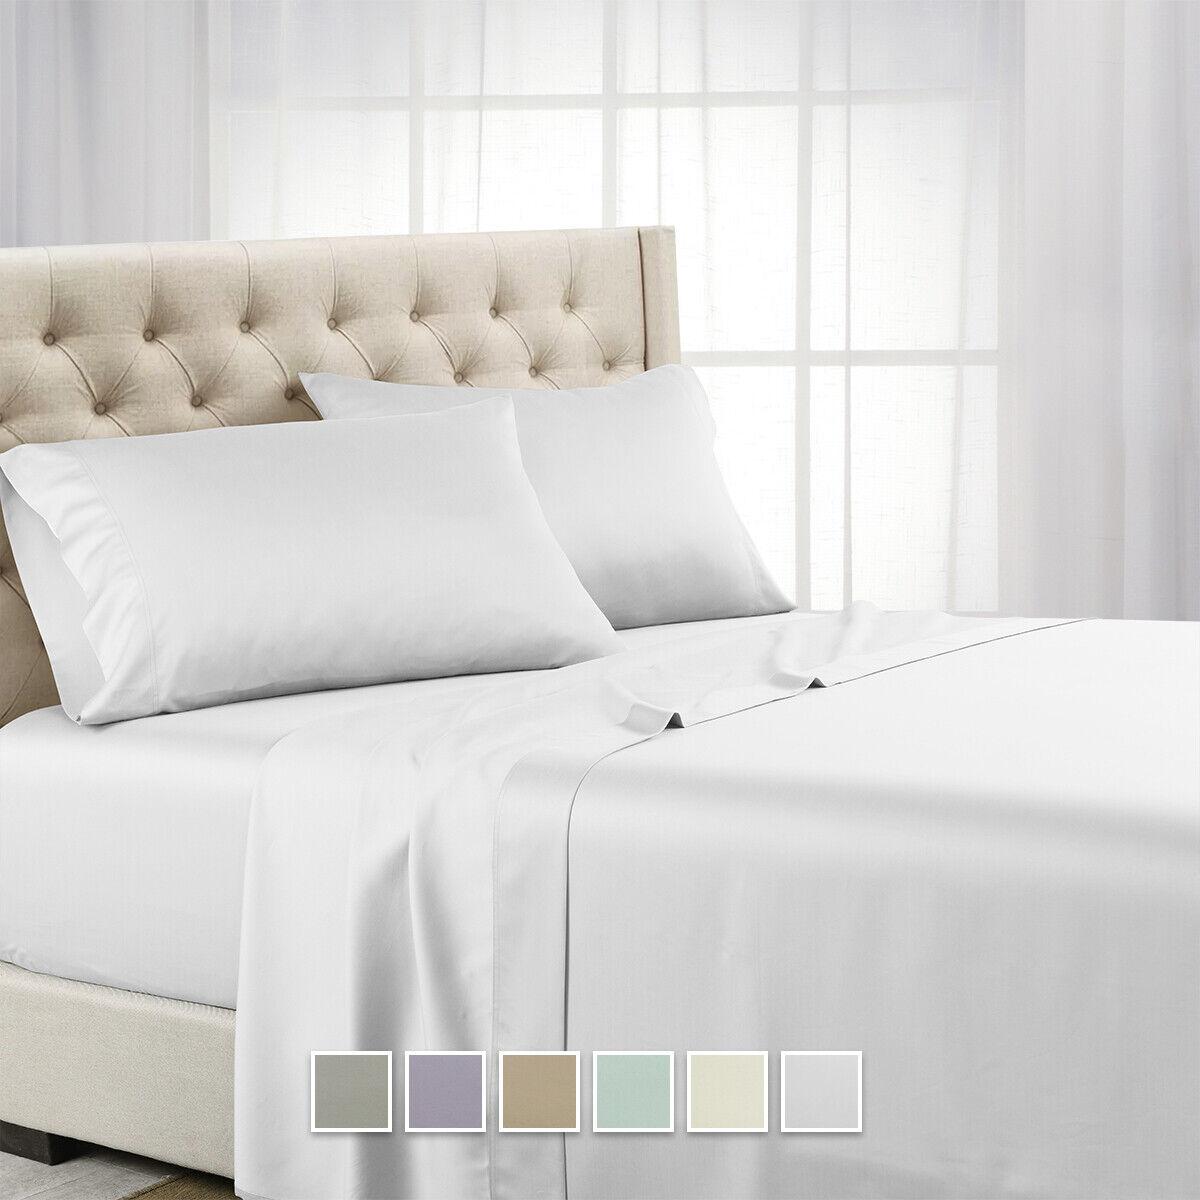 Flex-Top King 100% Tencel Lyocell Sheet Set 600 Thread Count for Adjustable Beds